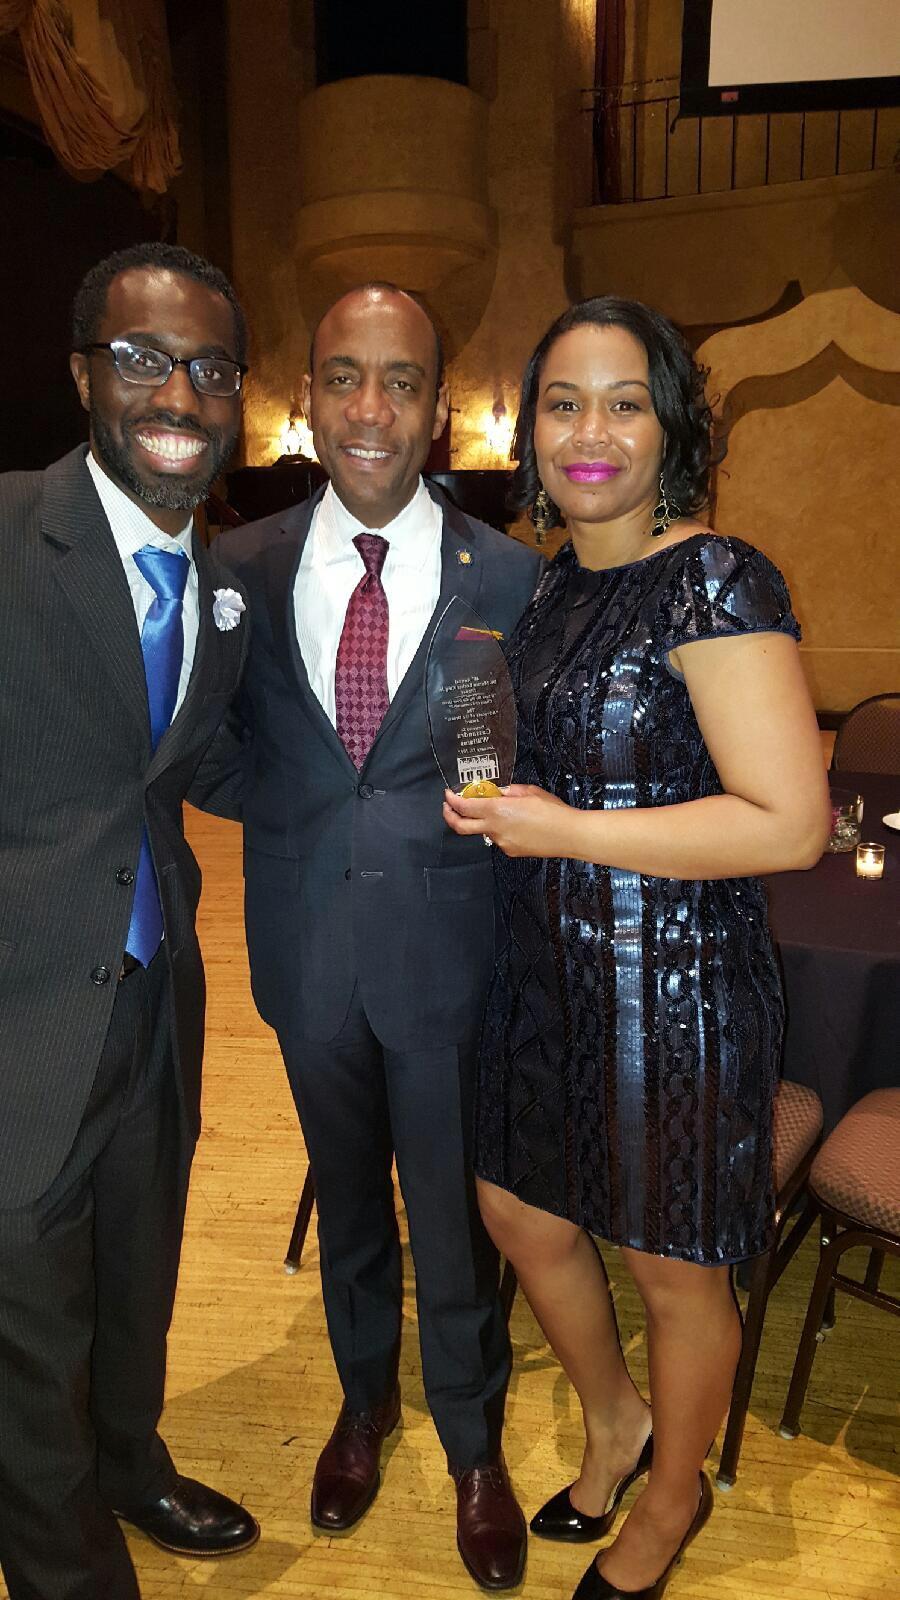 Awesome IUPUI Black Student Union MLK Dinner with Dream Award Winner  #CassandraWilliams and great speaker @CornellWBrooks #liberalartsworks https://t.co/0ZHlPjdeyg